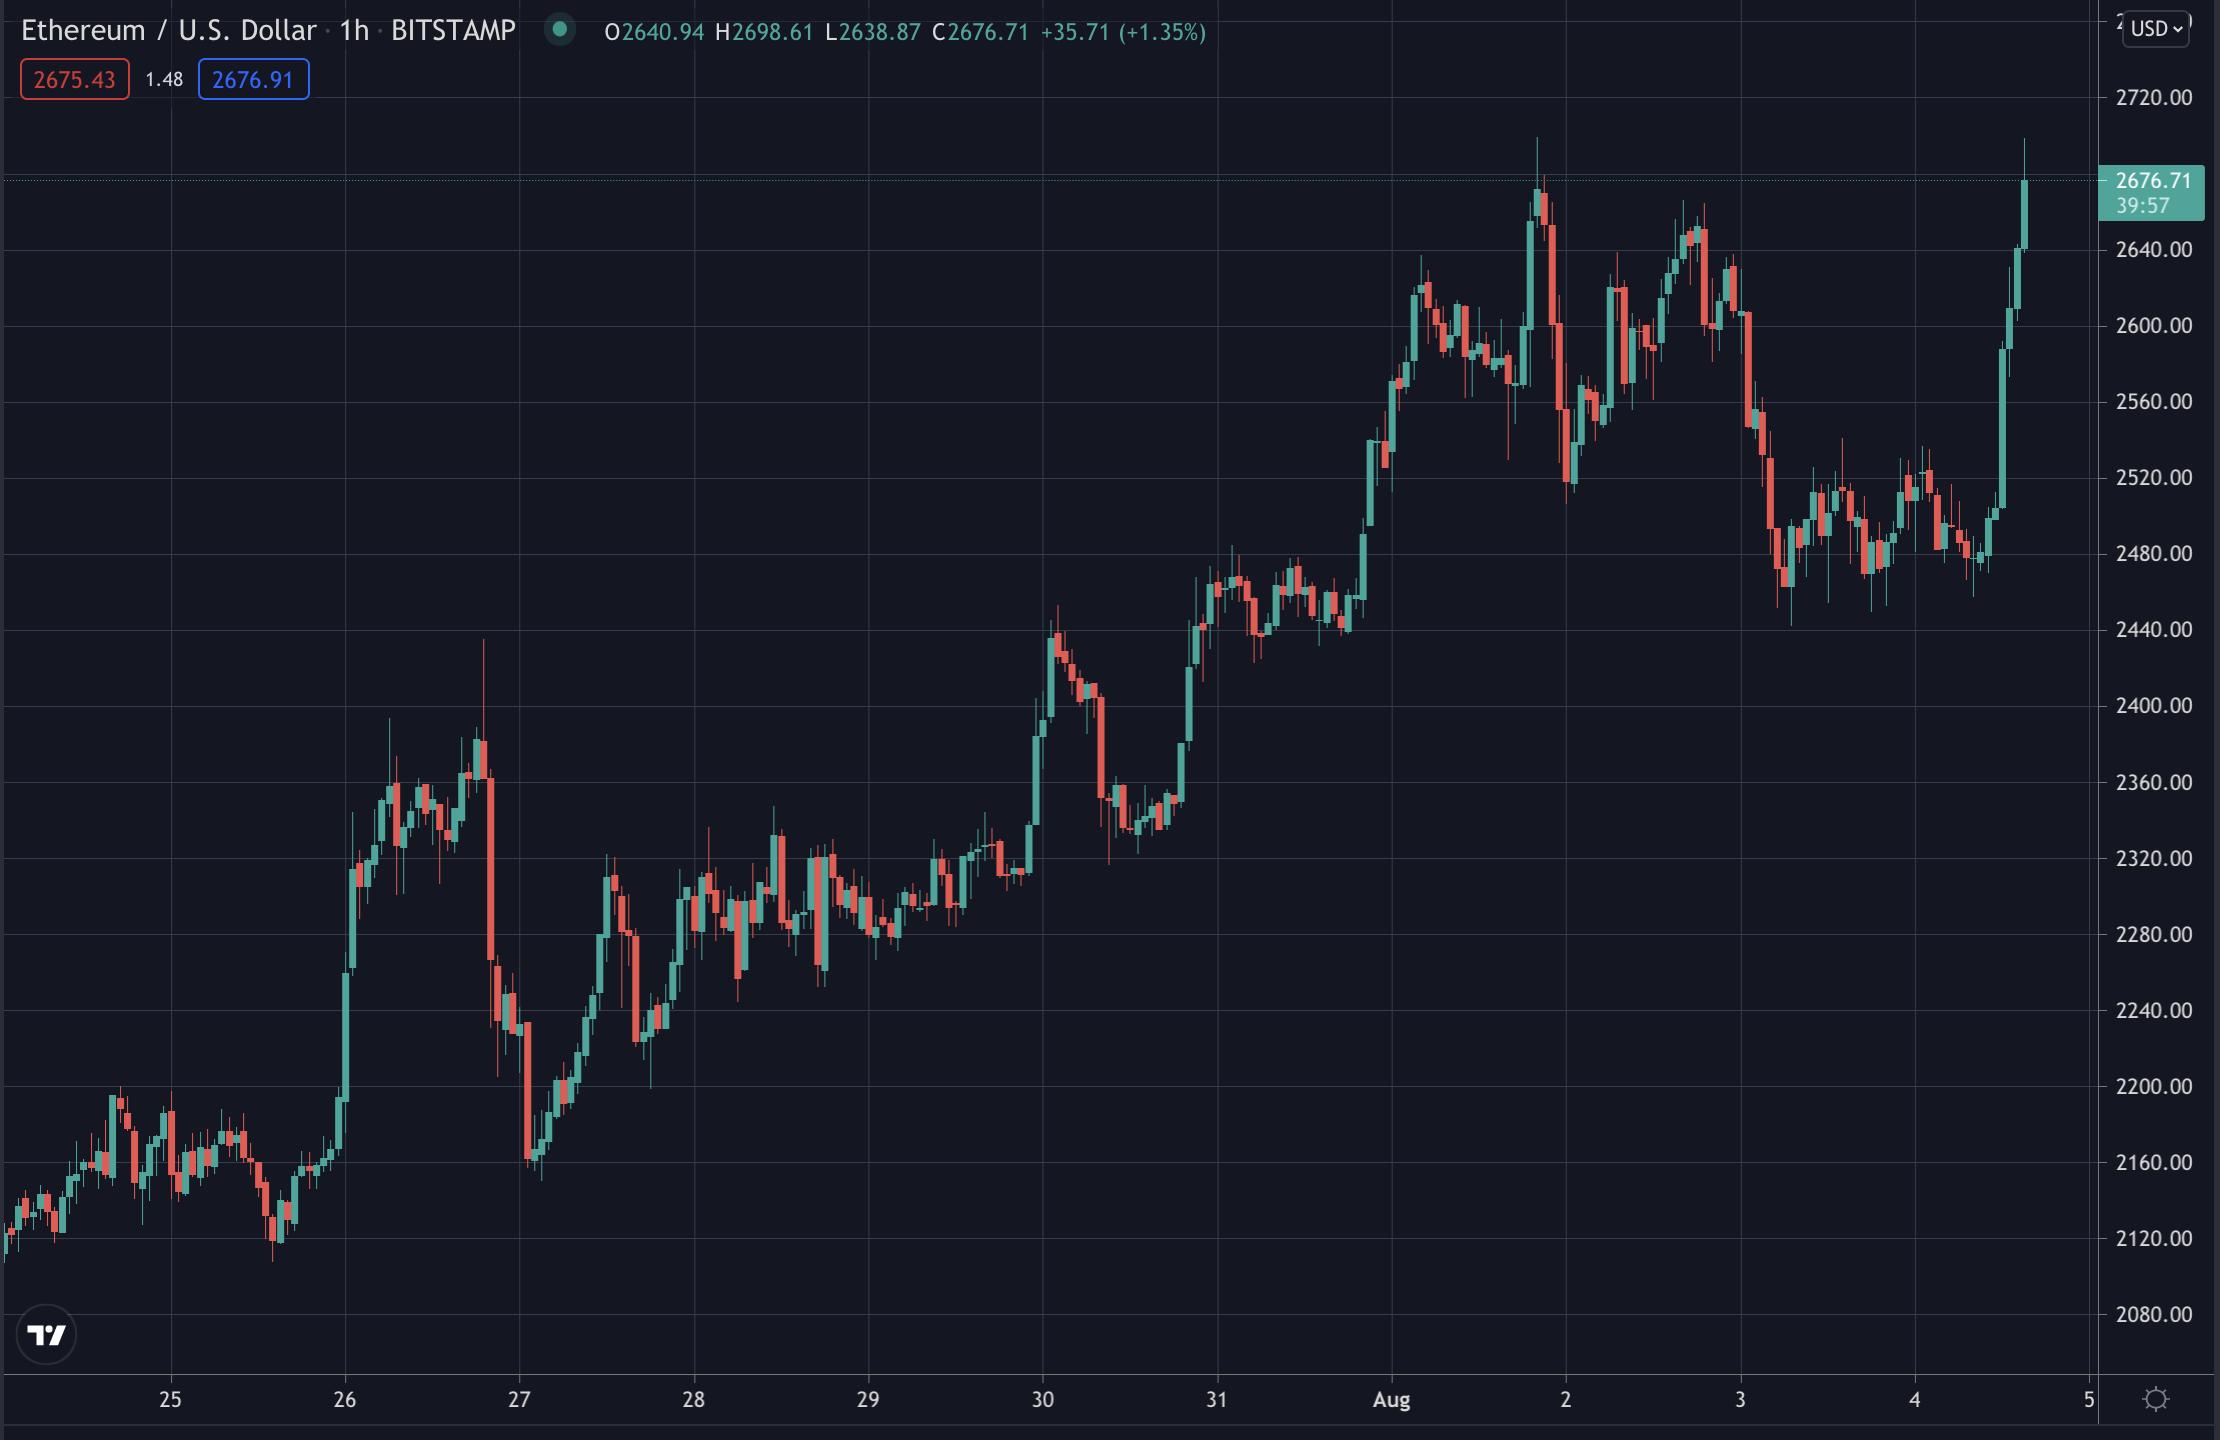 Ethereum price, Aug 2021